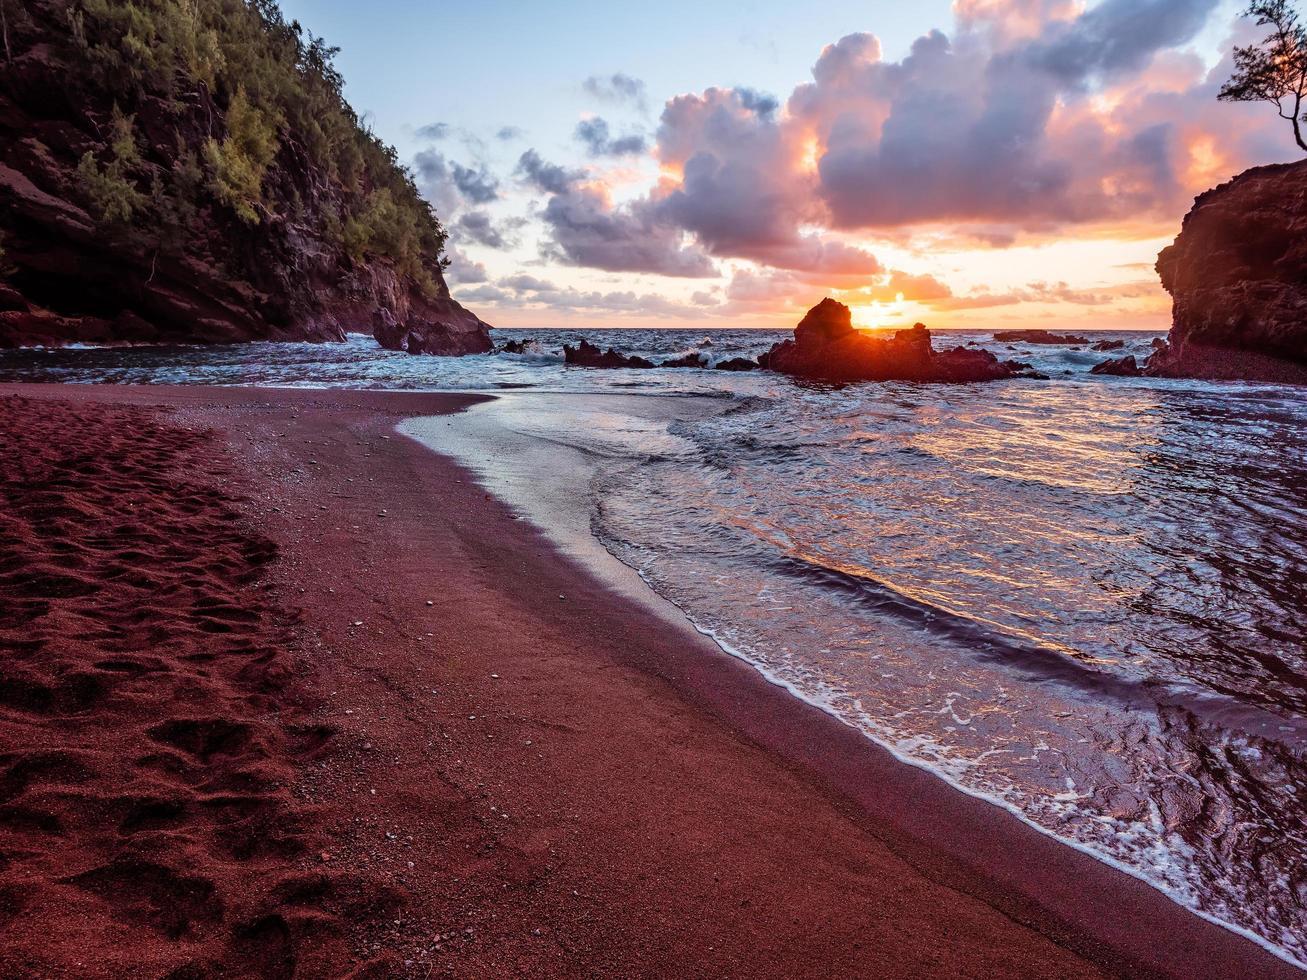 kaihalulu strand under solnedgång foto